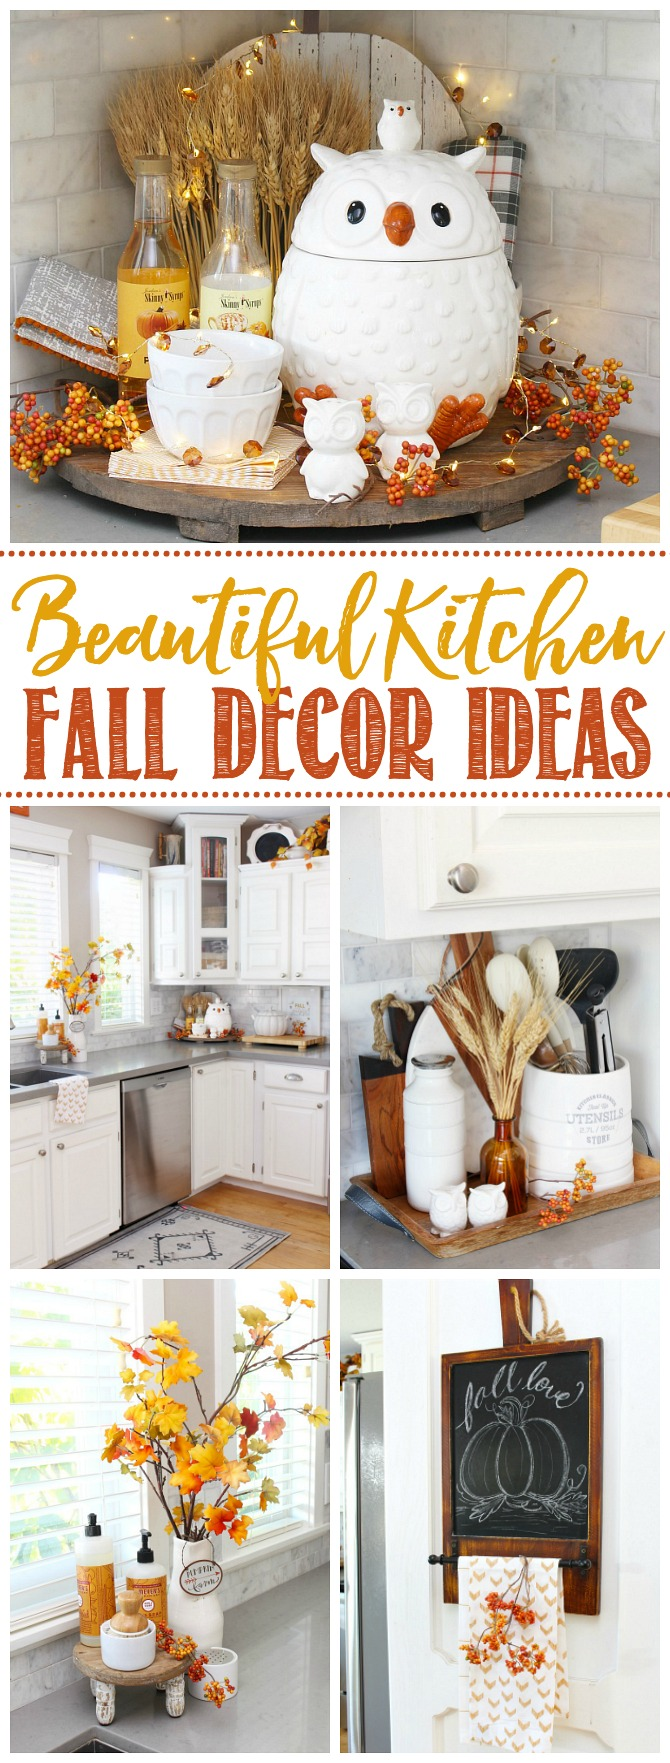 Collage of beautiful fall kitchen decor ideas.